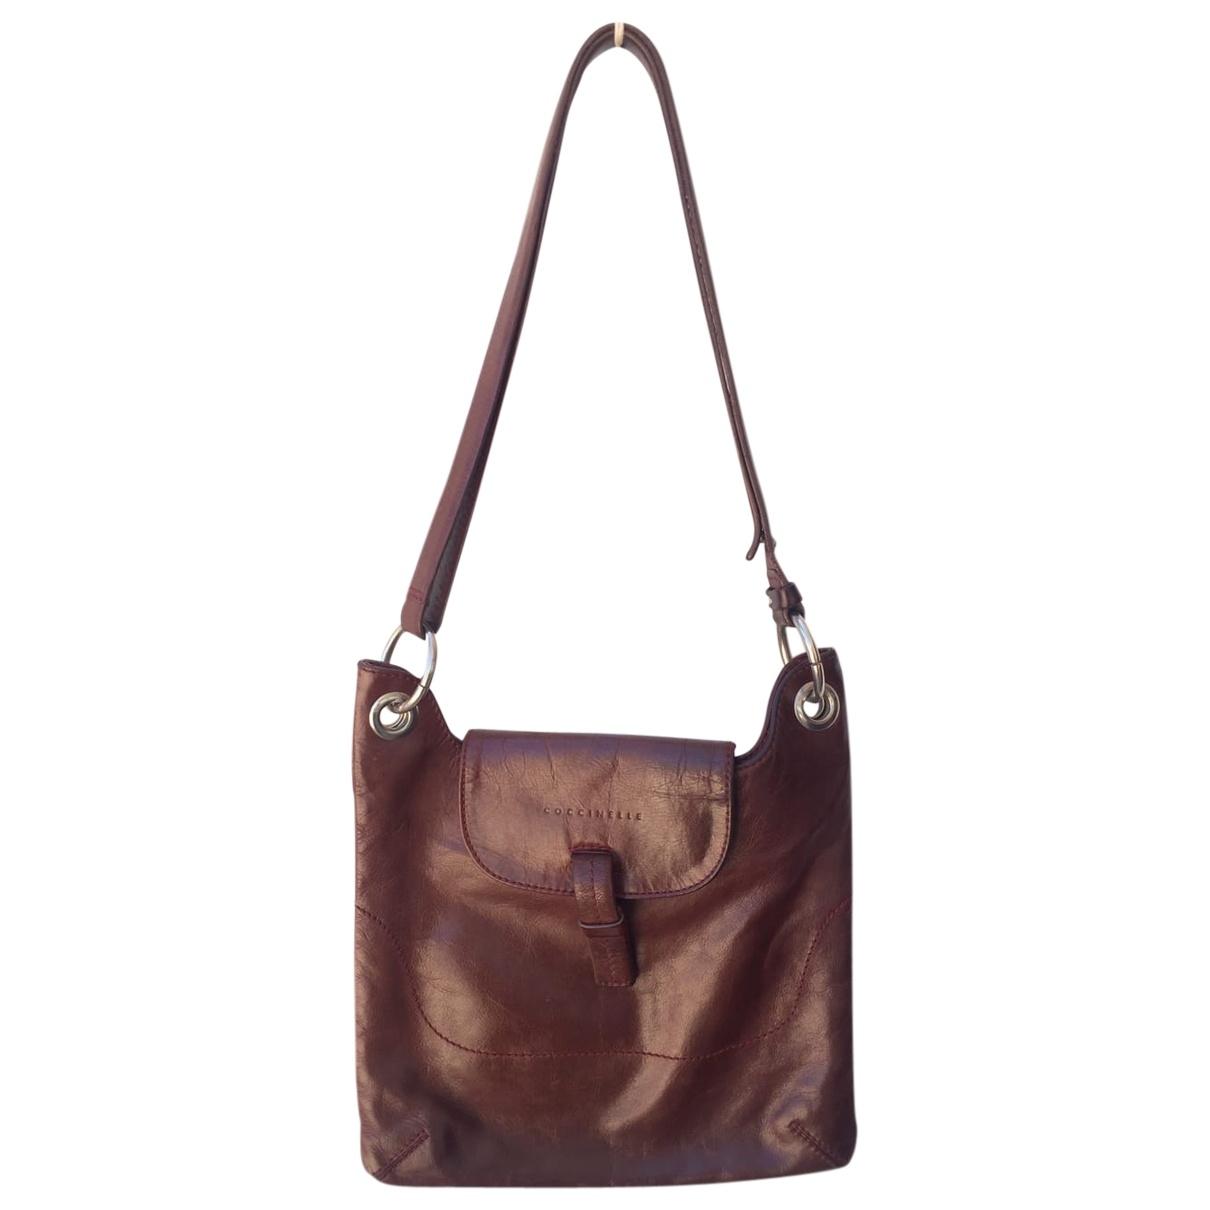 Coccinelle \N Camel Leather handbag for Women \N